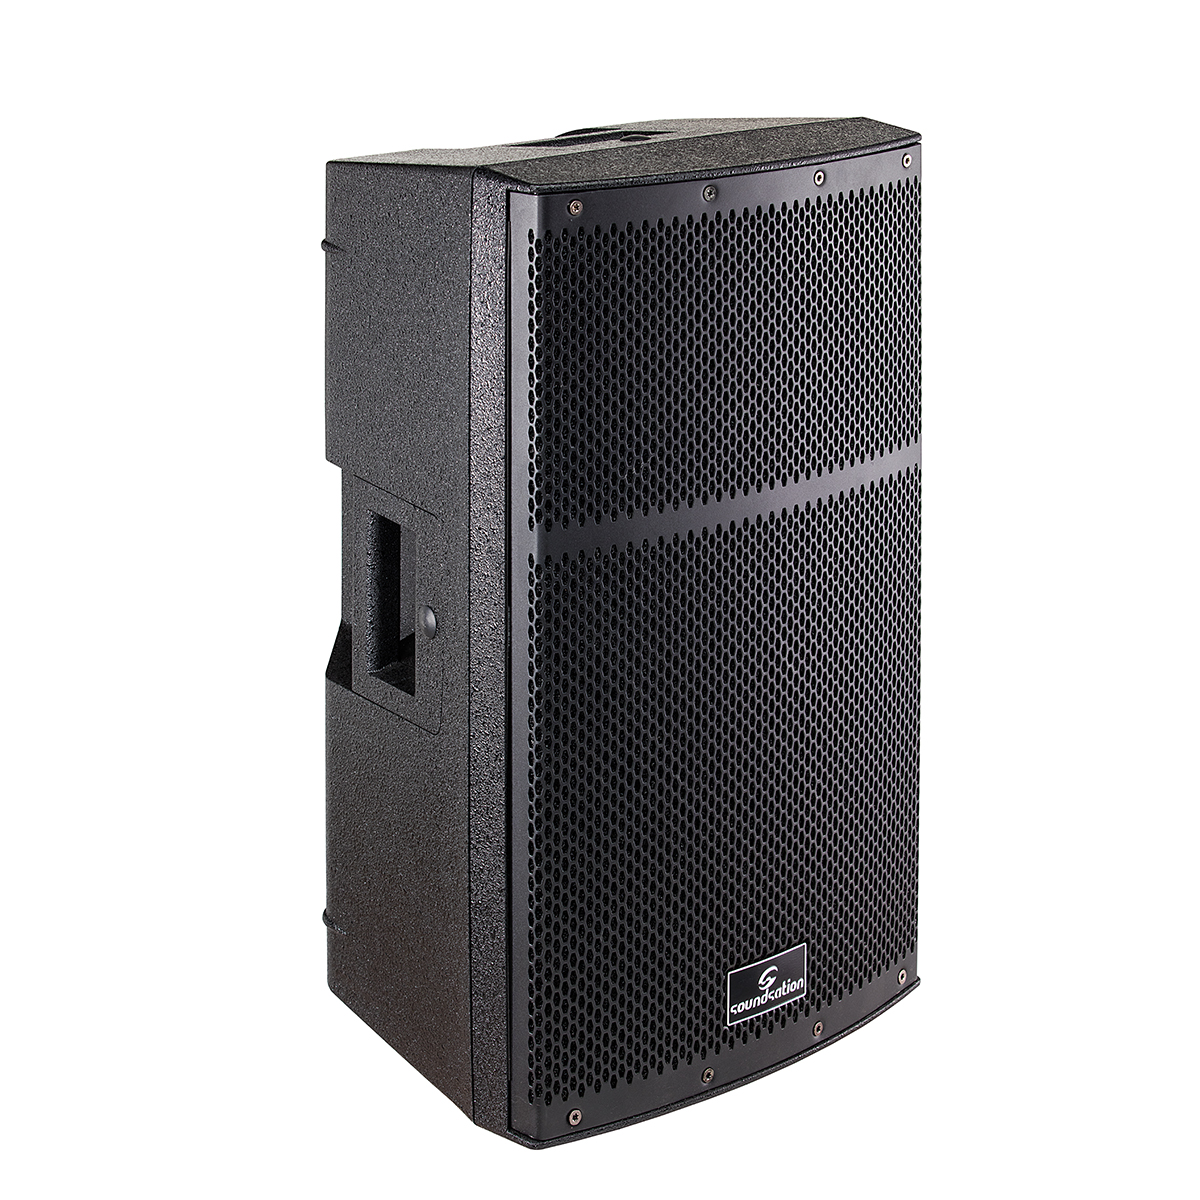 DIFFUSORE BI-AMP SOUNDSATION HYPER-PRO TOP 15A 1800W CLASSE D+AB